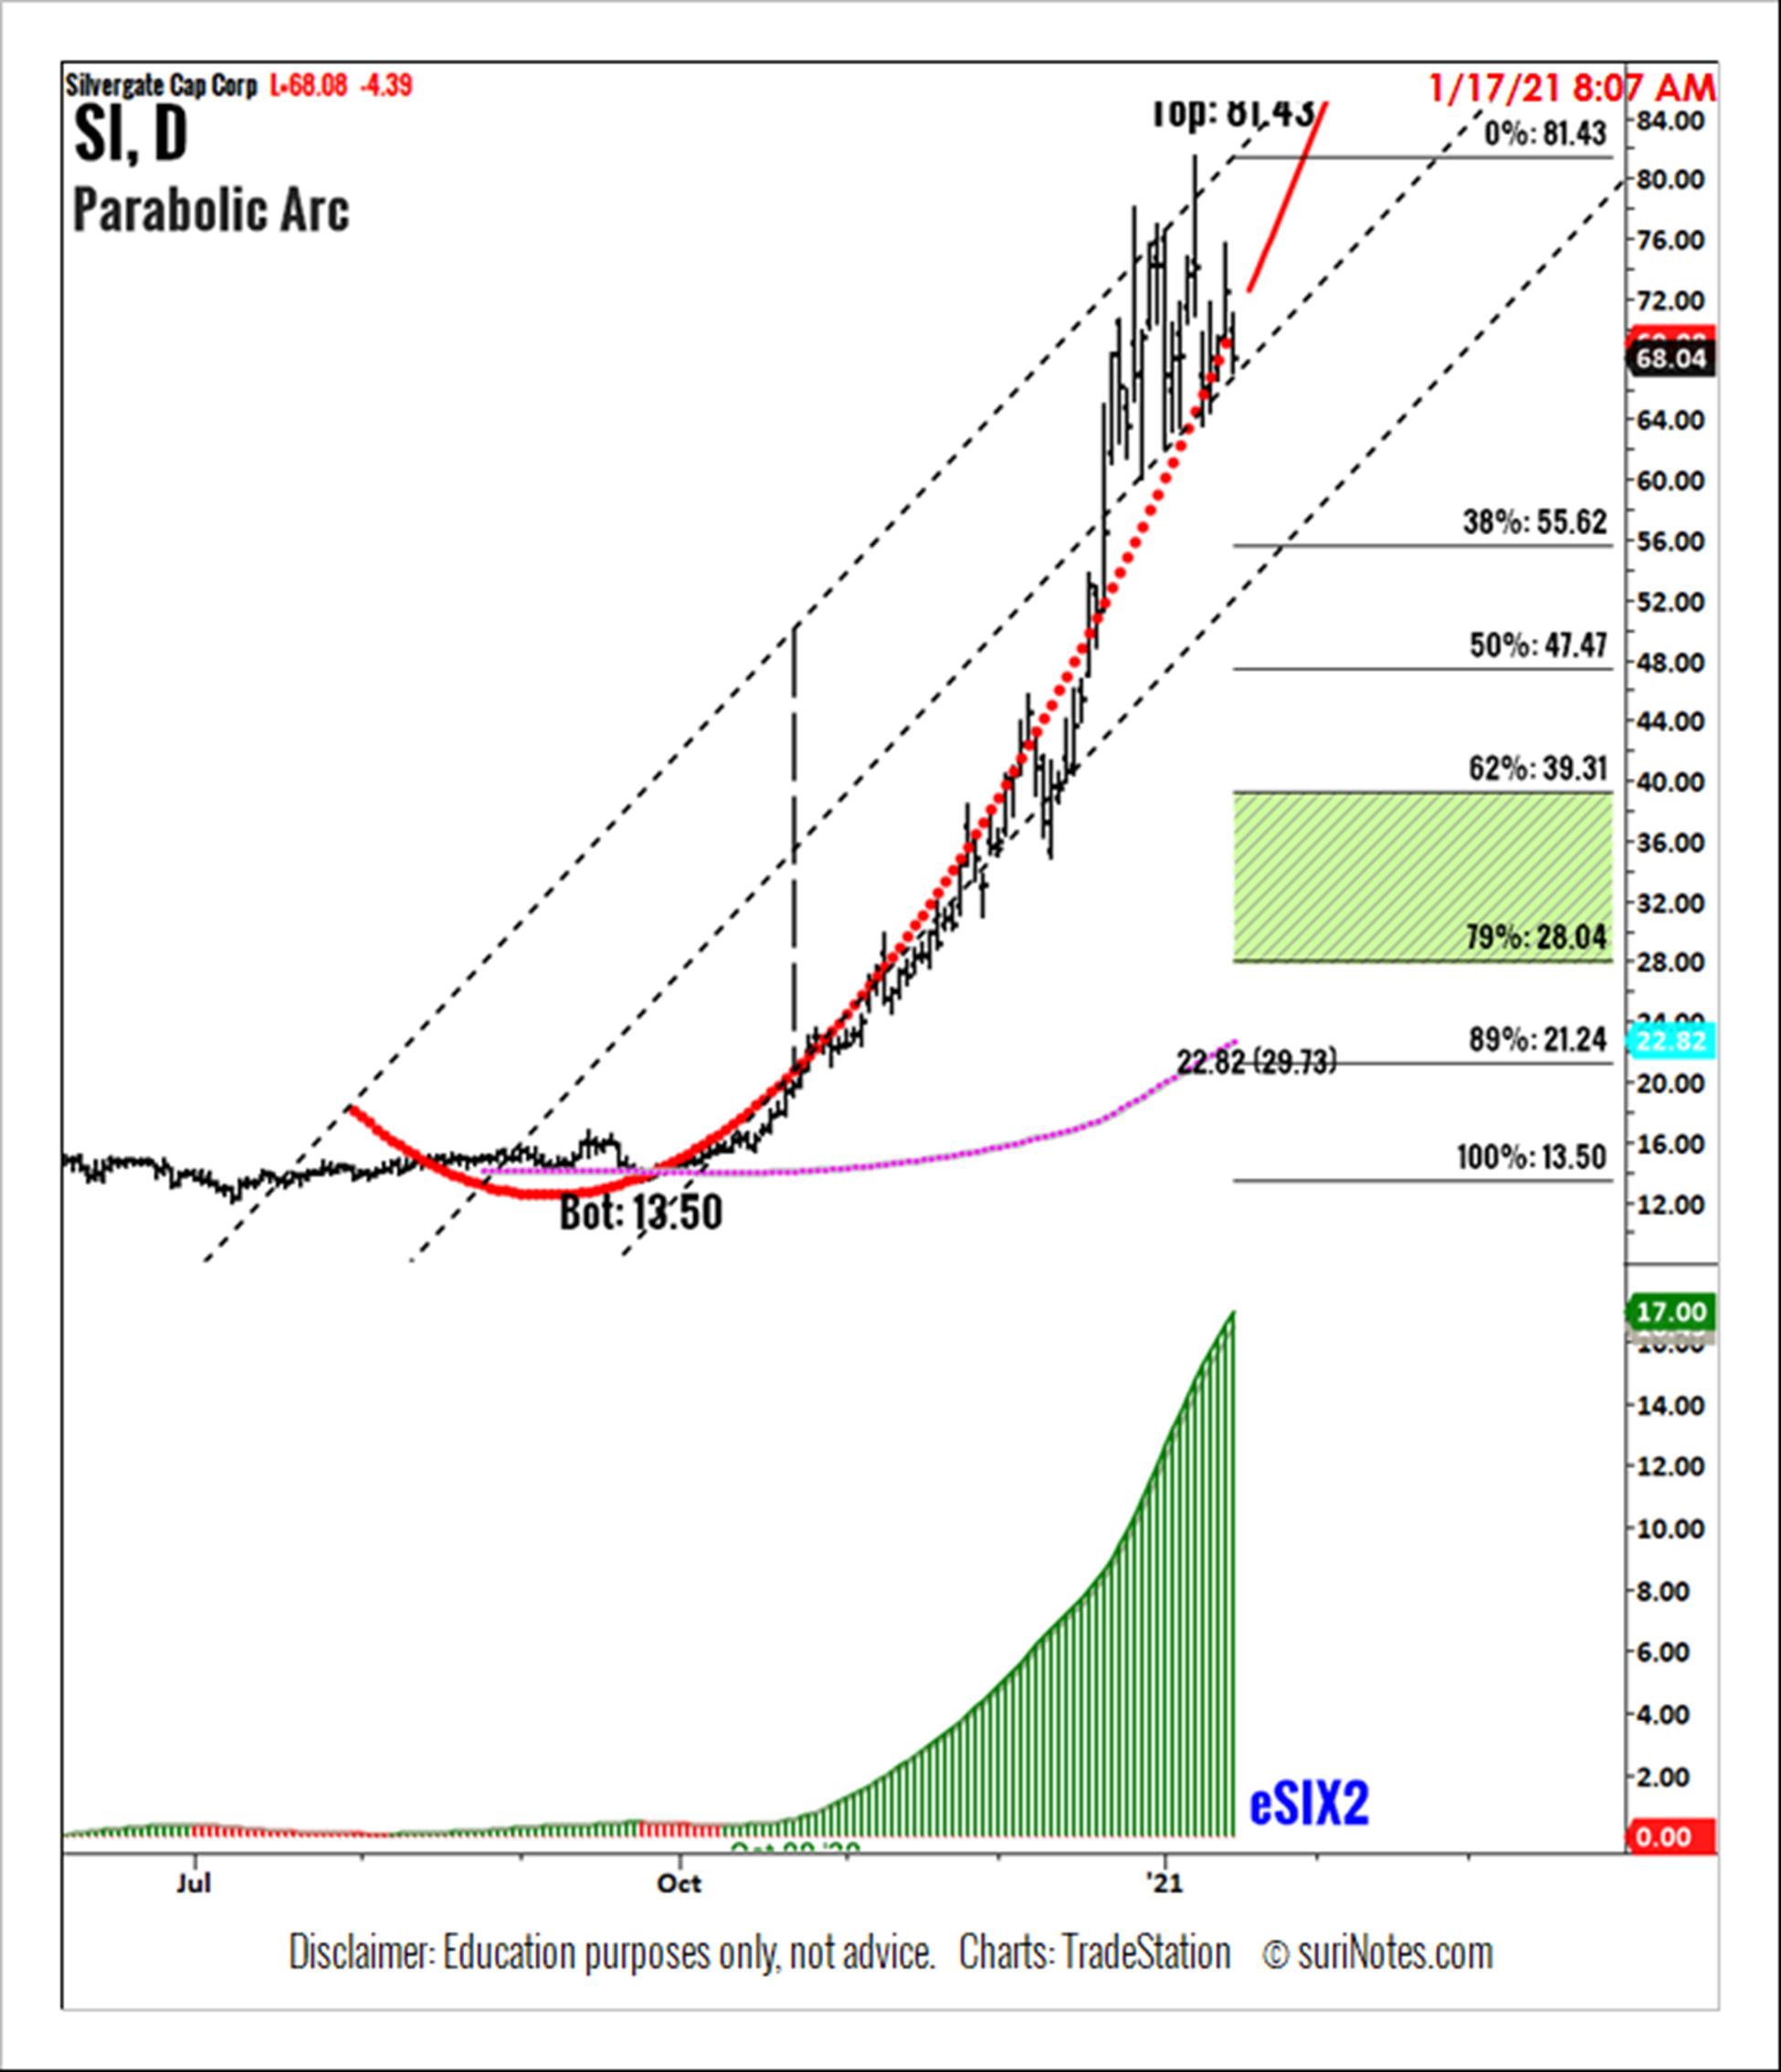 Silver Gate Corp. (SI) Parabolic Arc pattern